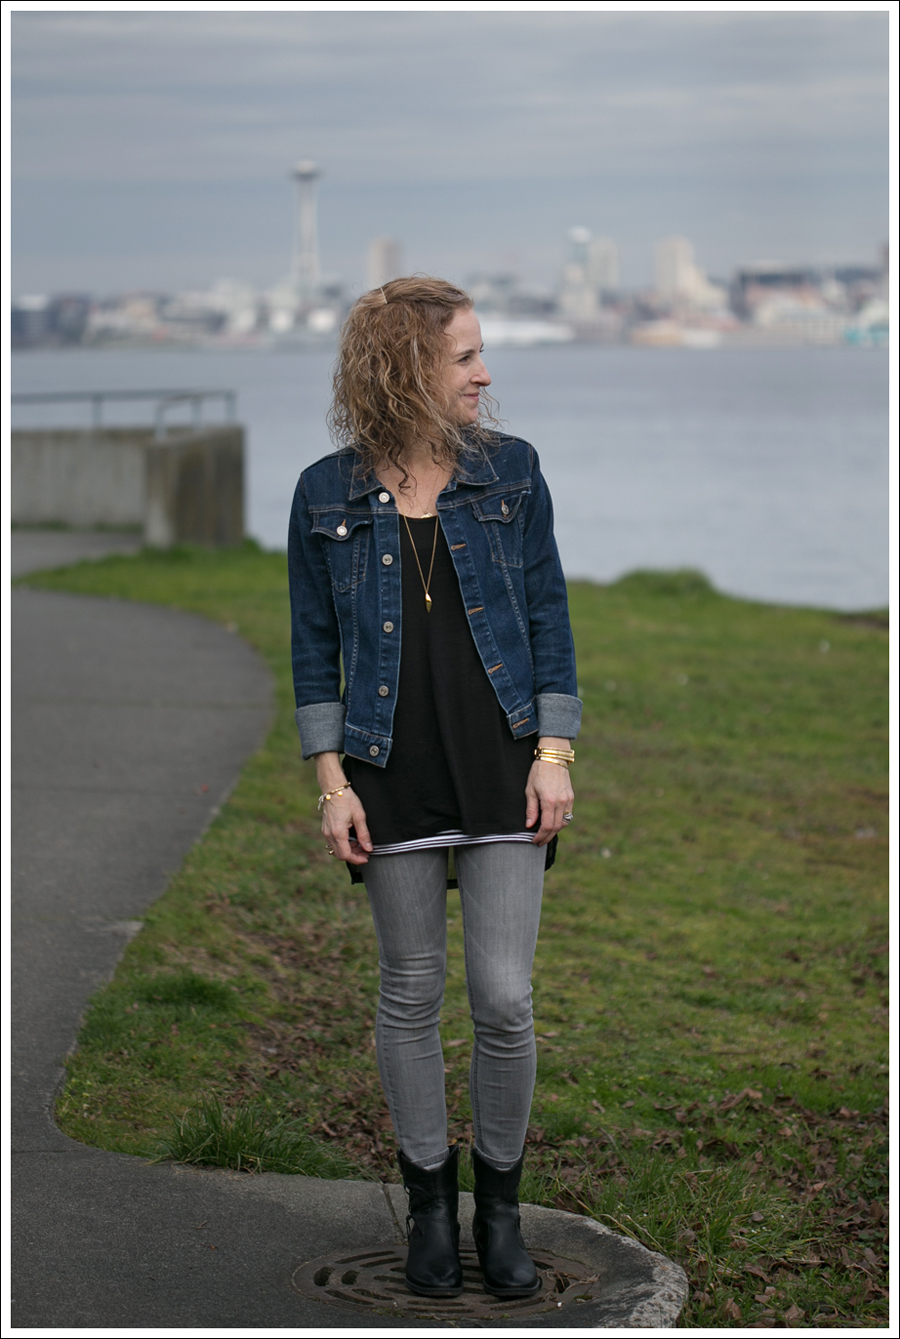 Blog Juicy Jacket HM Top Joes Jeans Born Booties-1